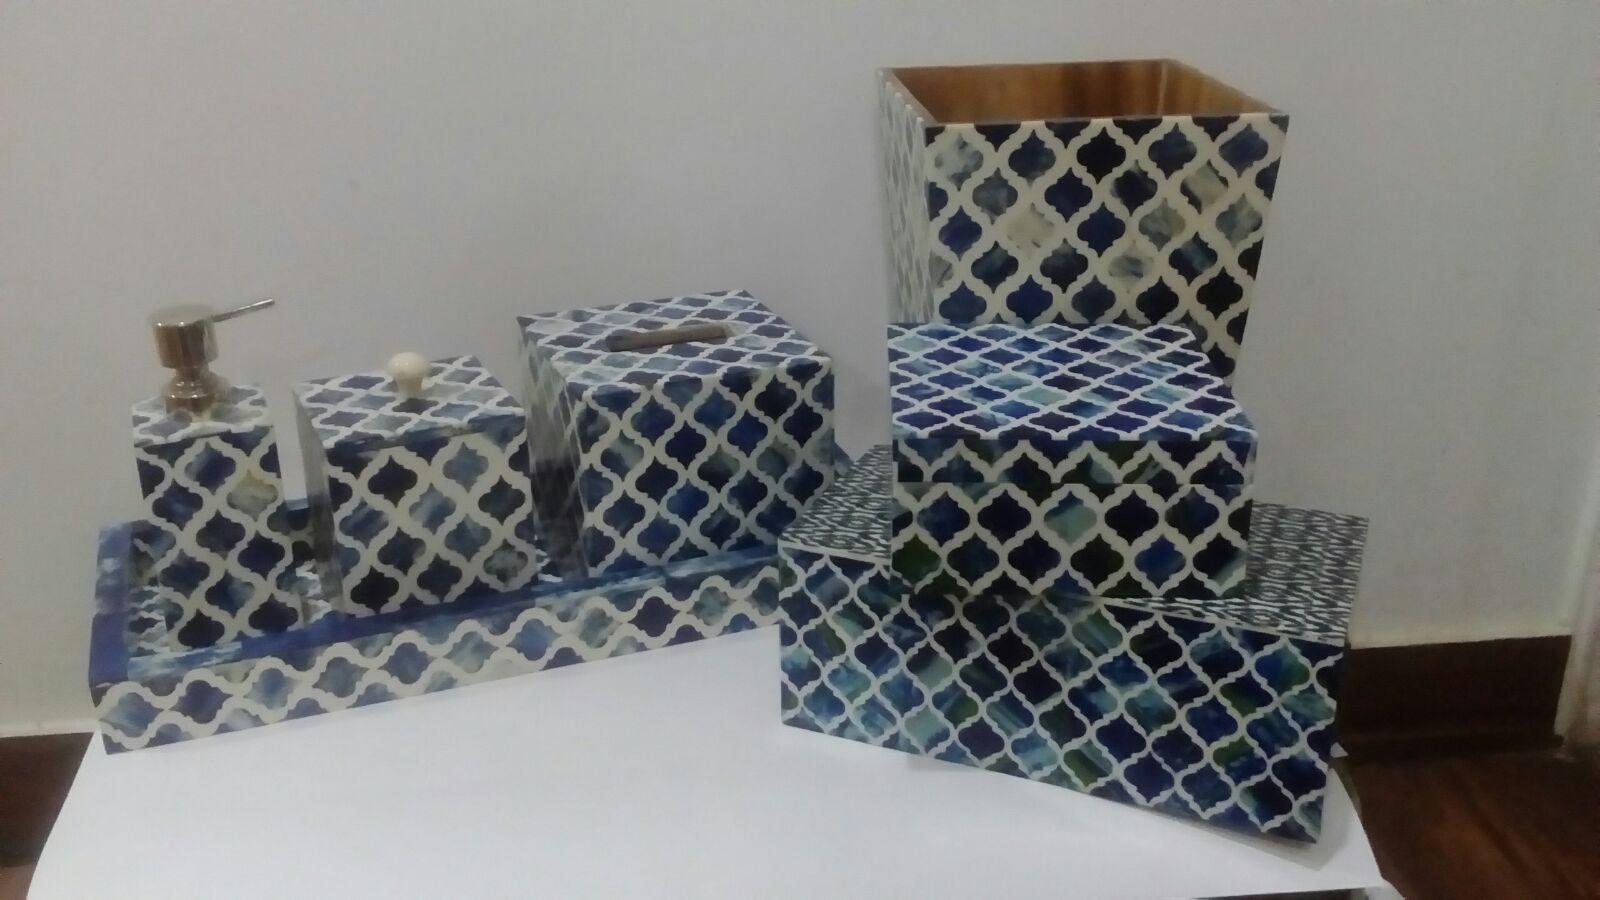 Bone crafted bathroom accessories set manufacturer in for Bathroom accessories set india